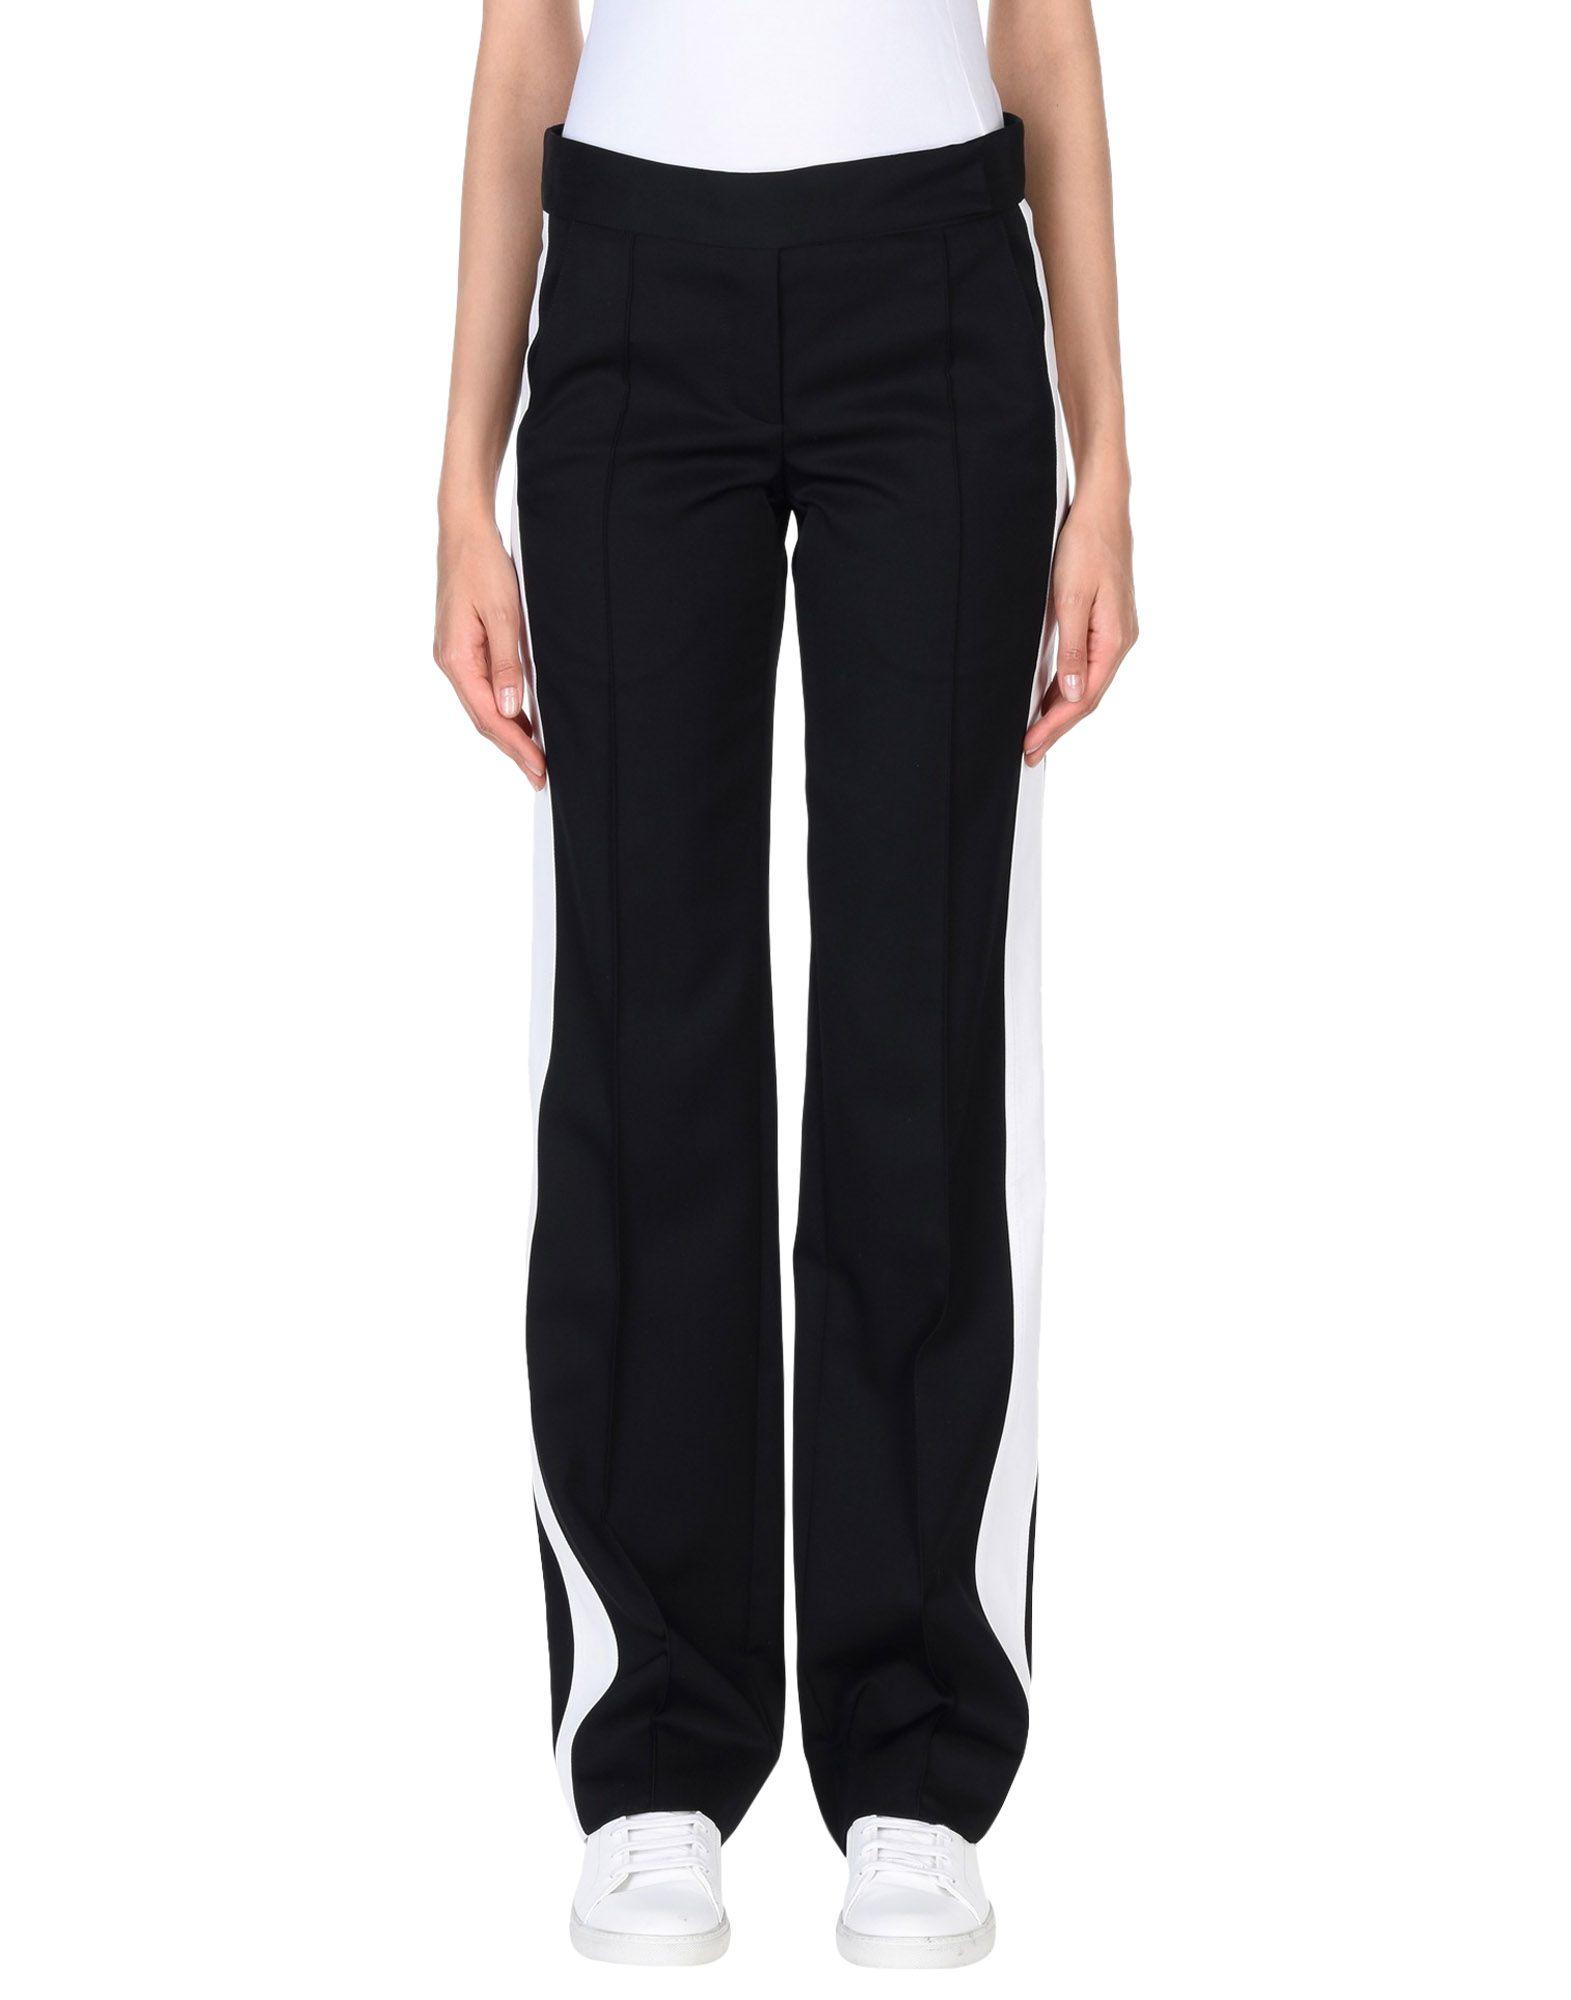 Pantalone Paco Rabanne Donna - Acquista online su D5bUWf